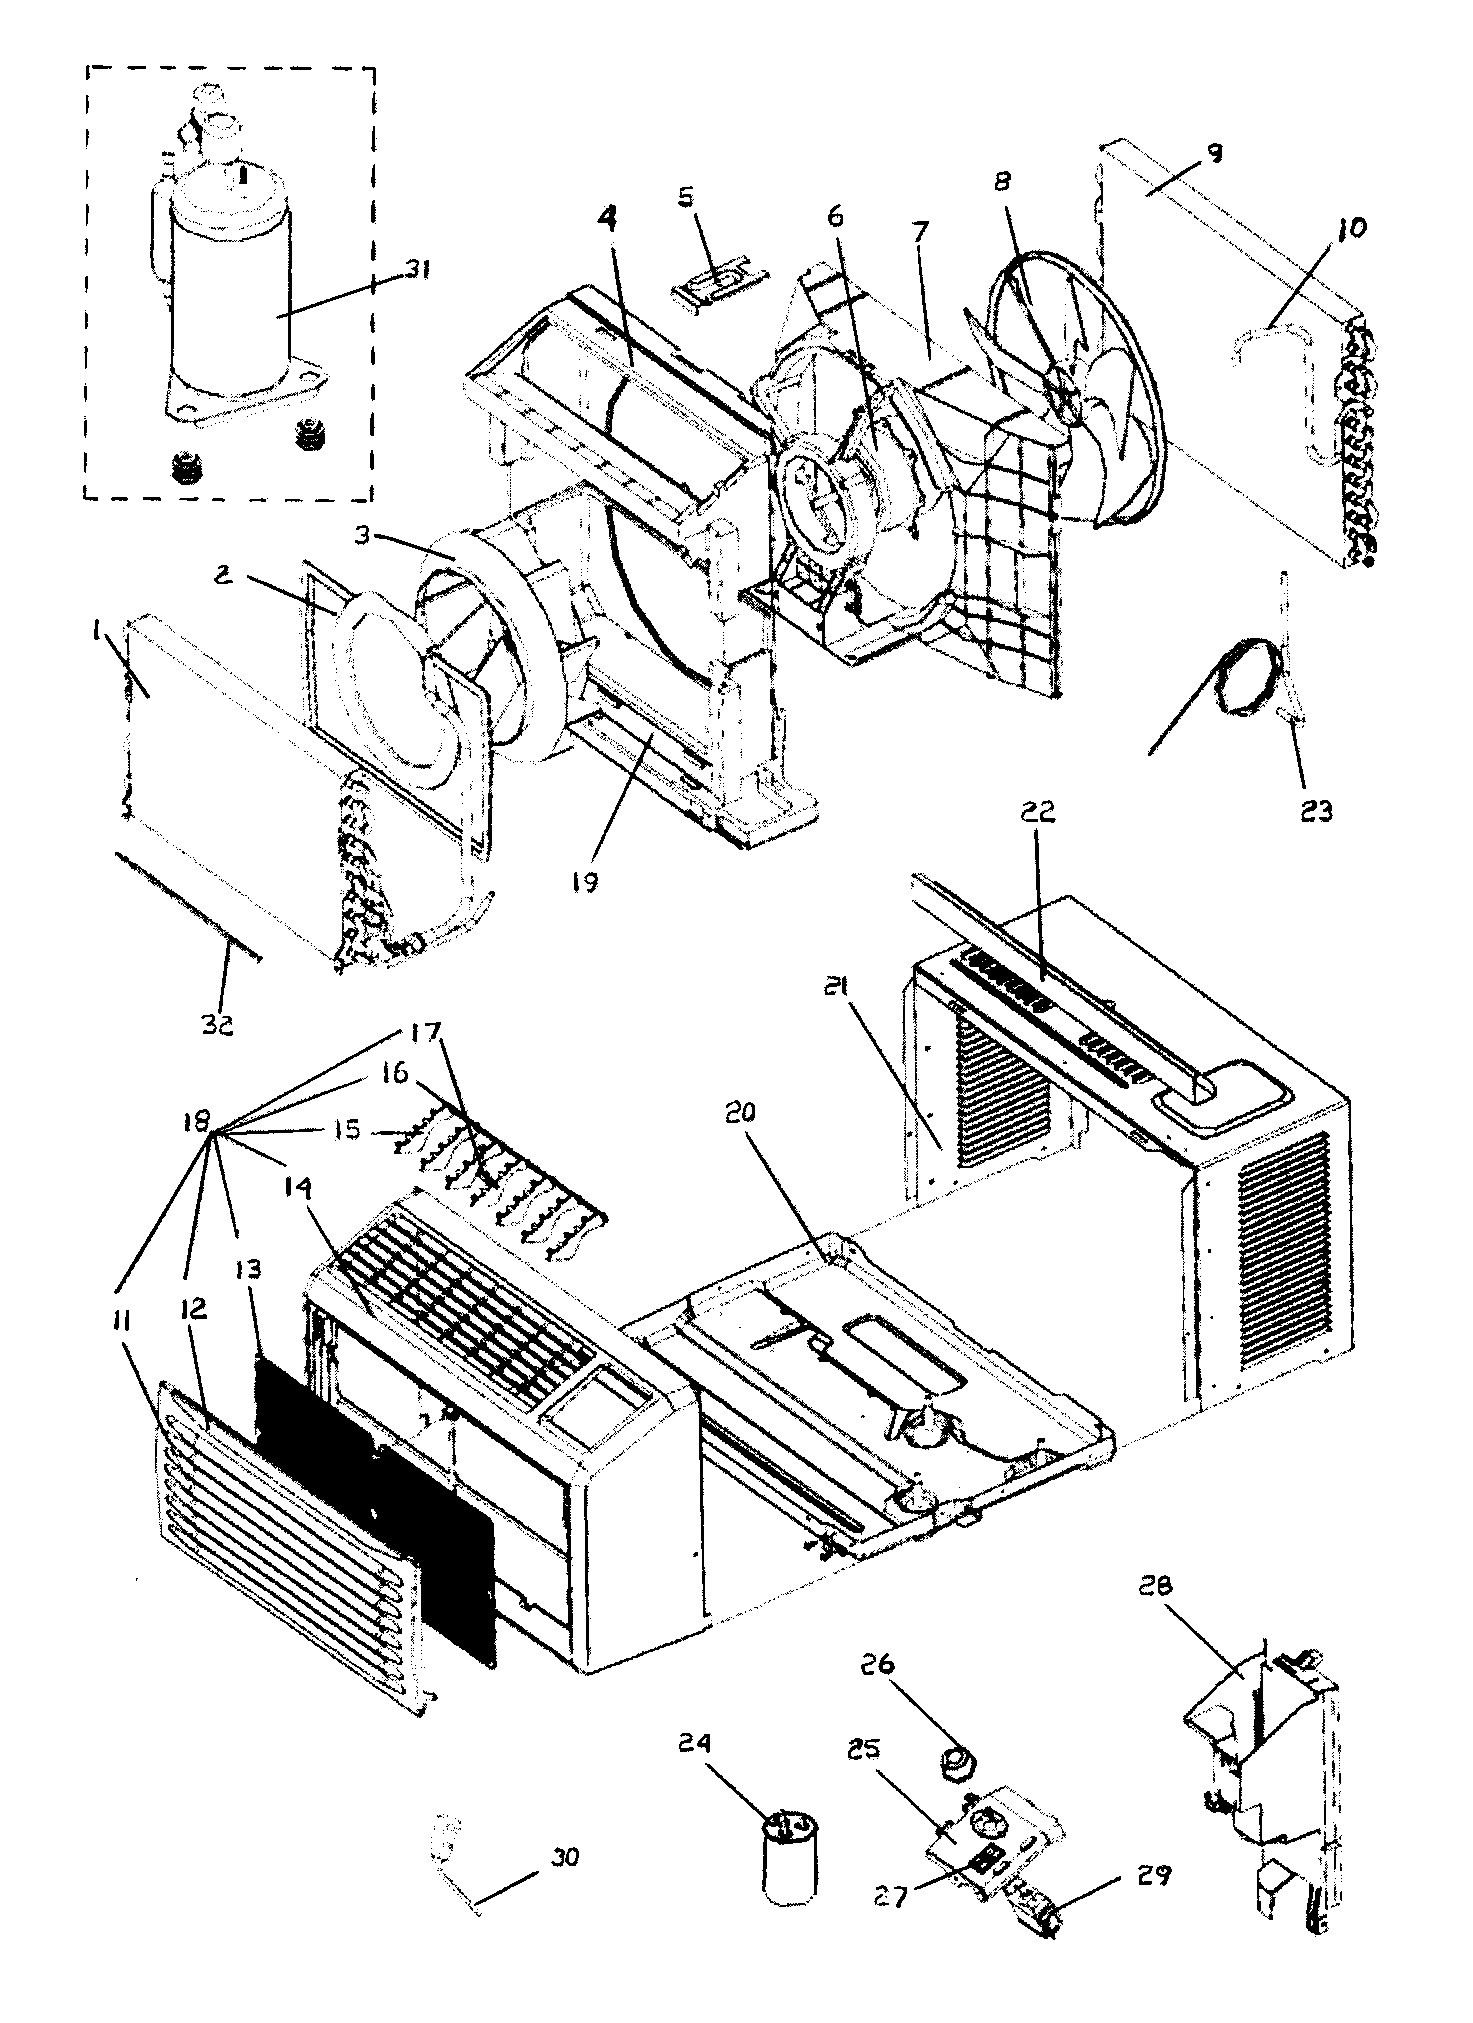 [DIAGRAM] Wiring Diagram Haier Air Conditioner FULL